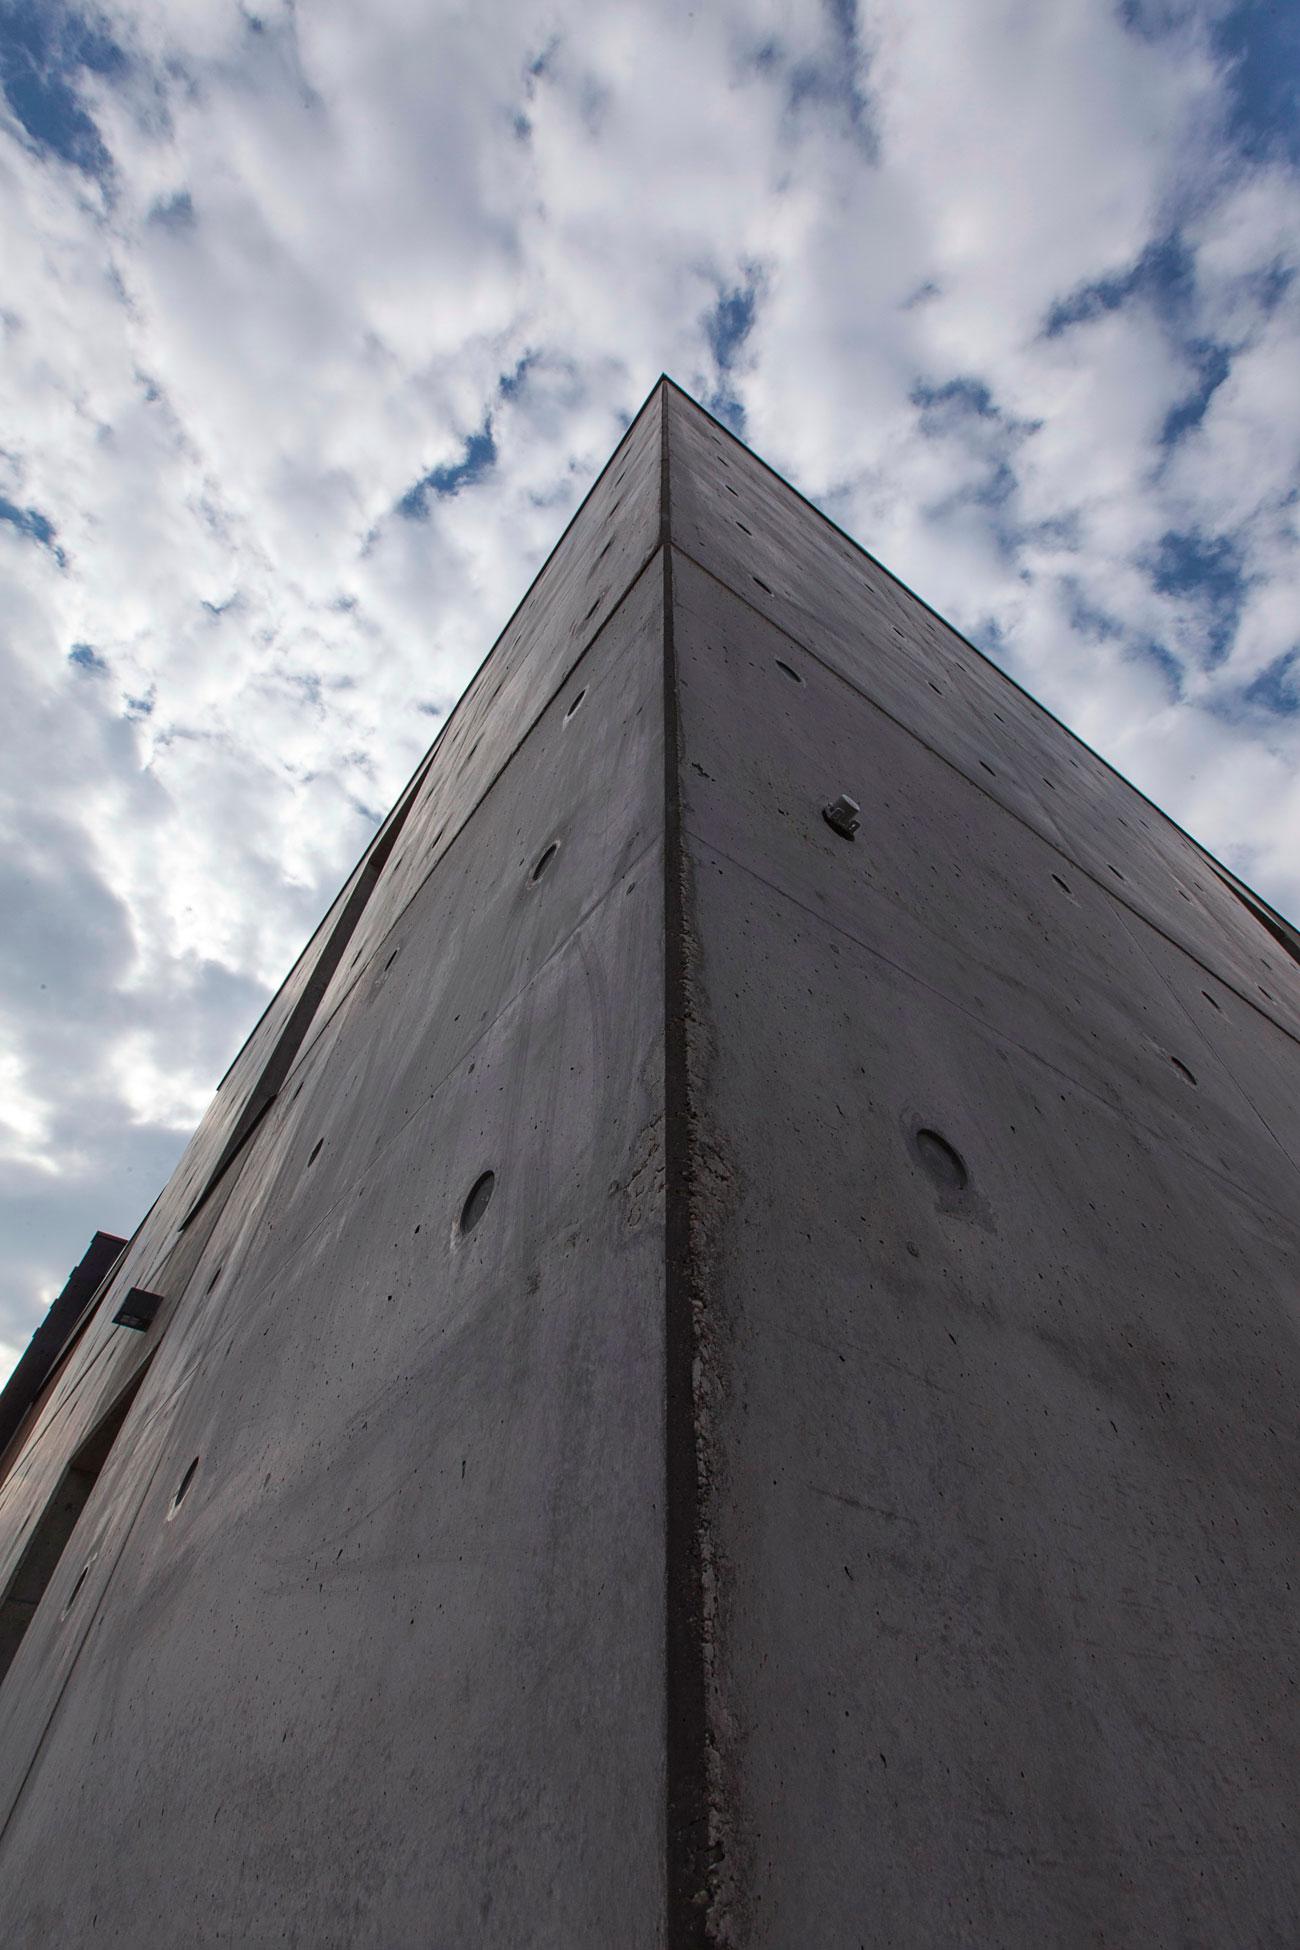 D'Autore Residence near Bologna by Giraldi Associati Architetti-12